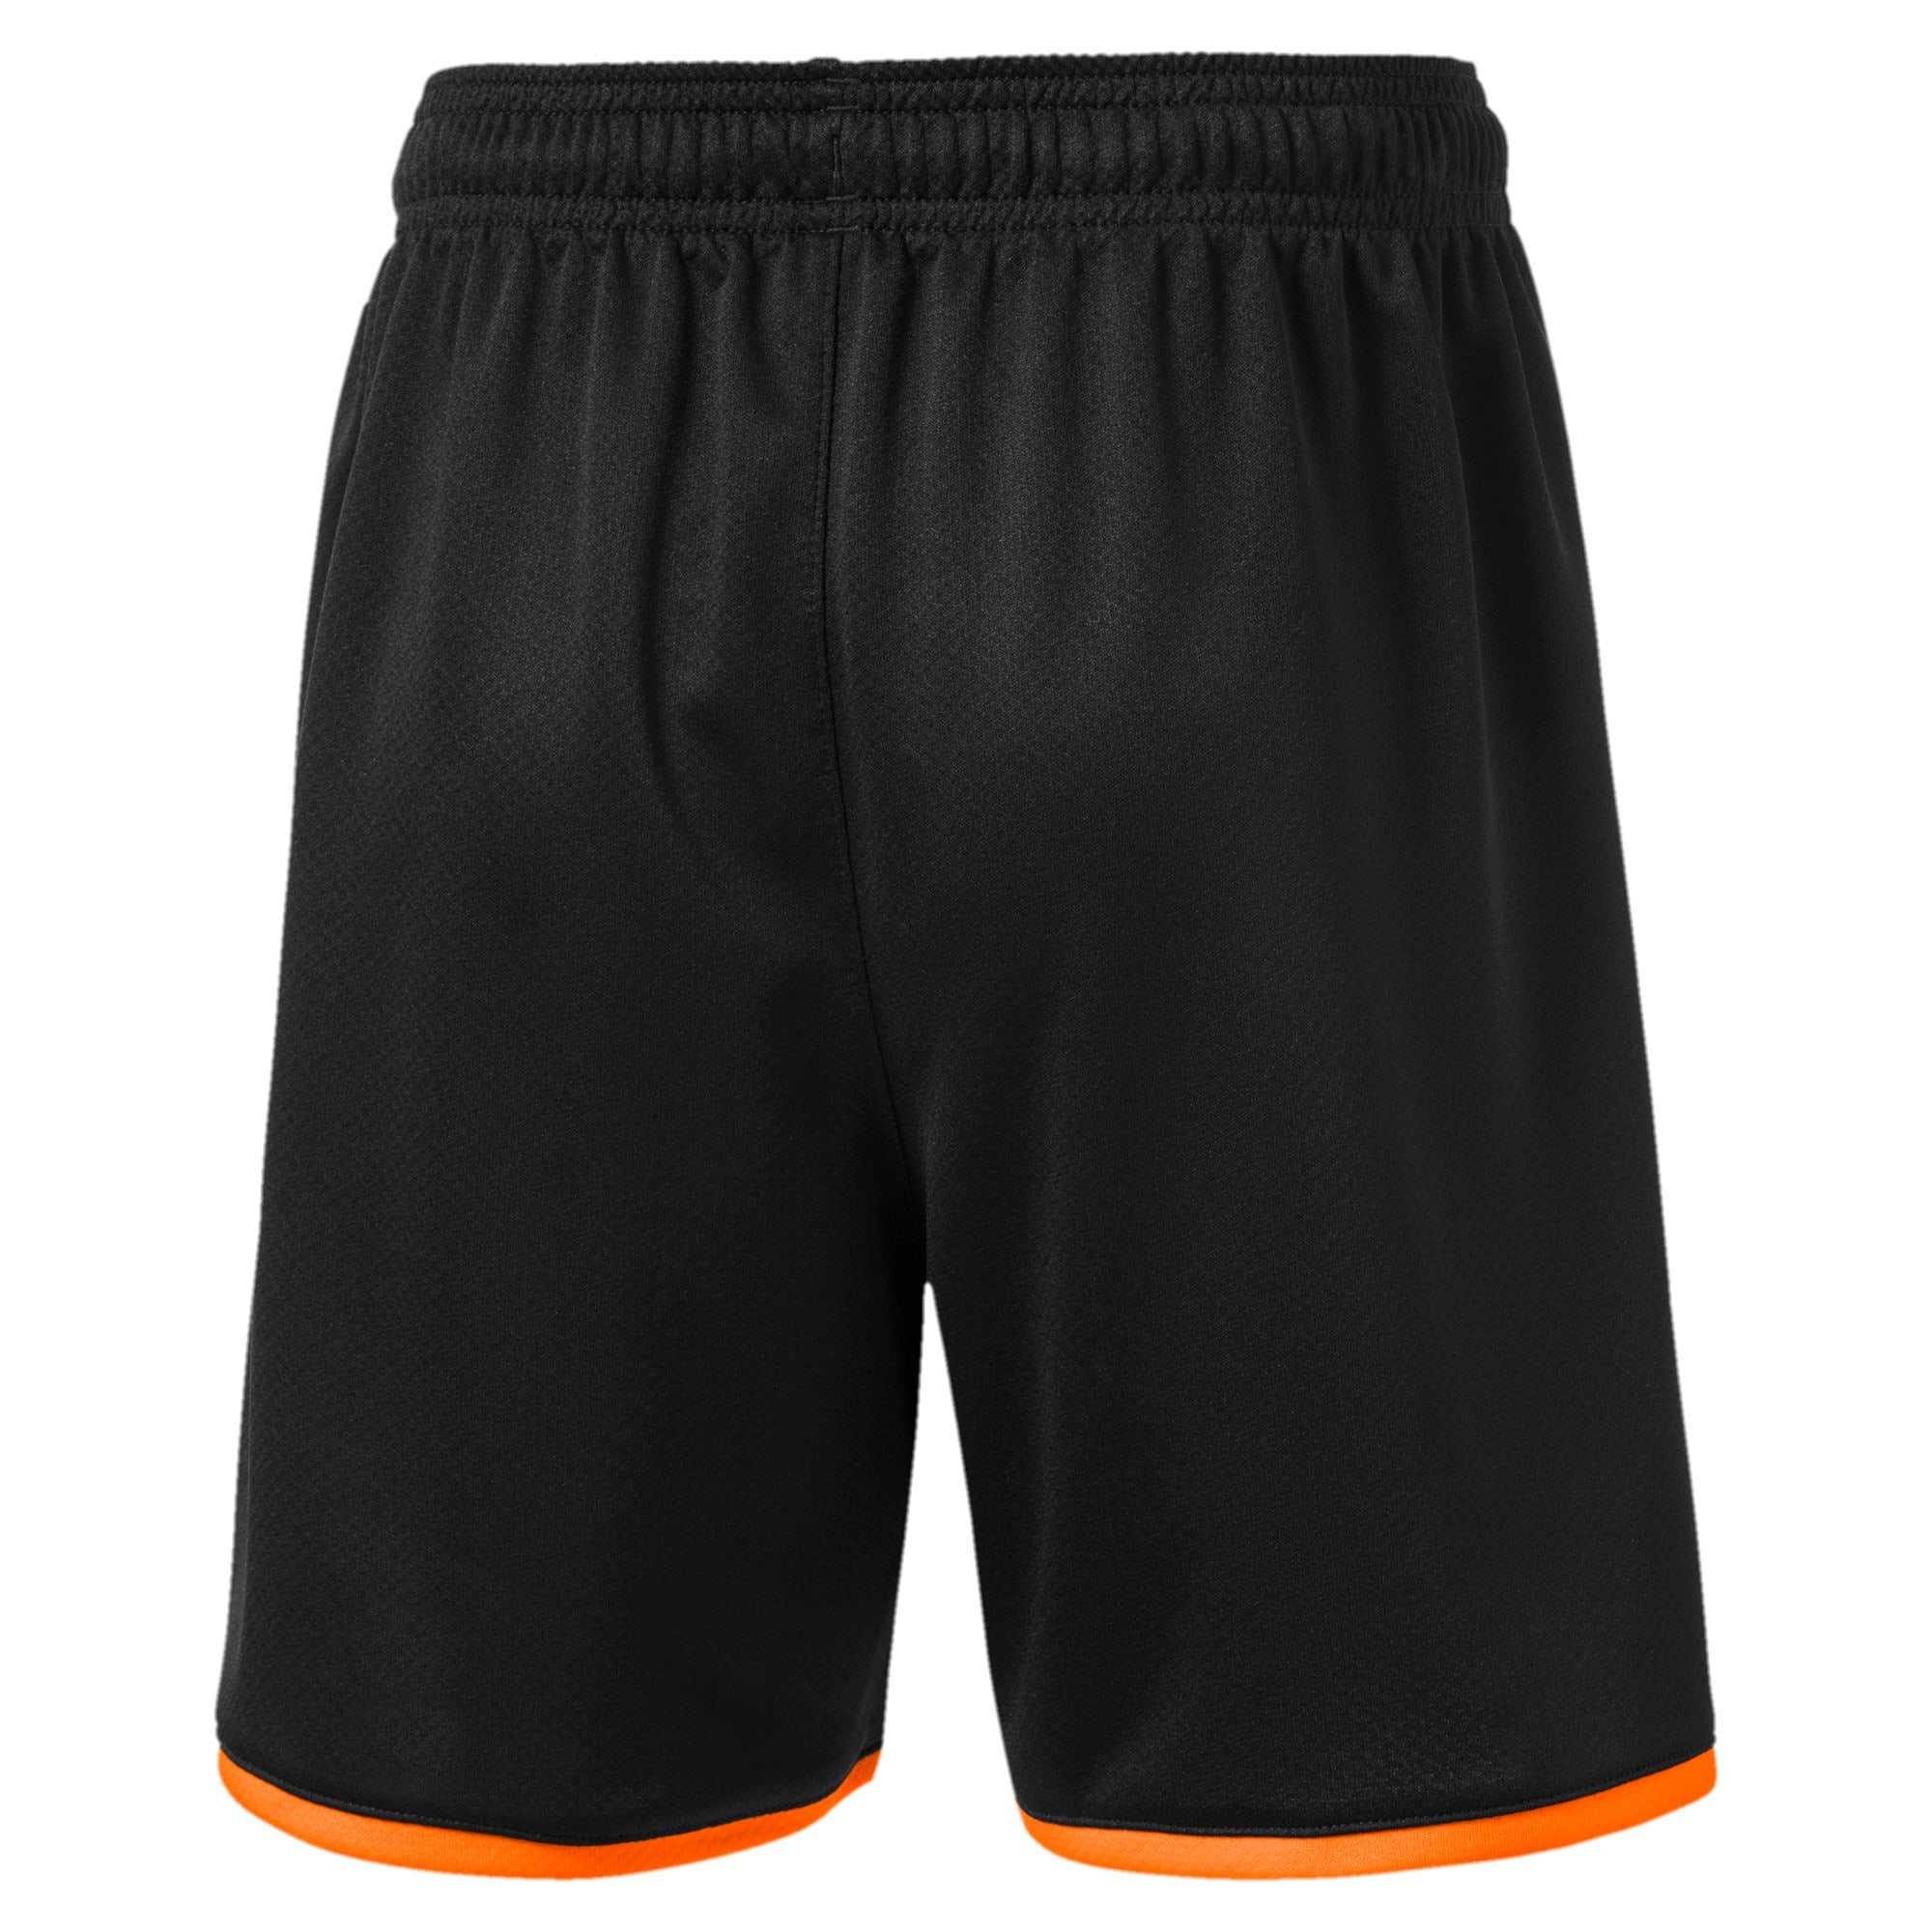 Thumbnail 2 of Valencia CF Boys' Replica Shorts, Puma Black-Vibrant Orange, medium